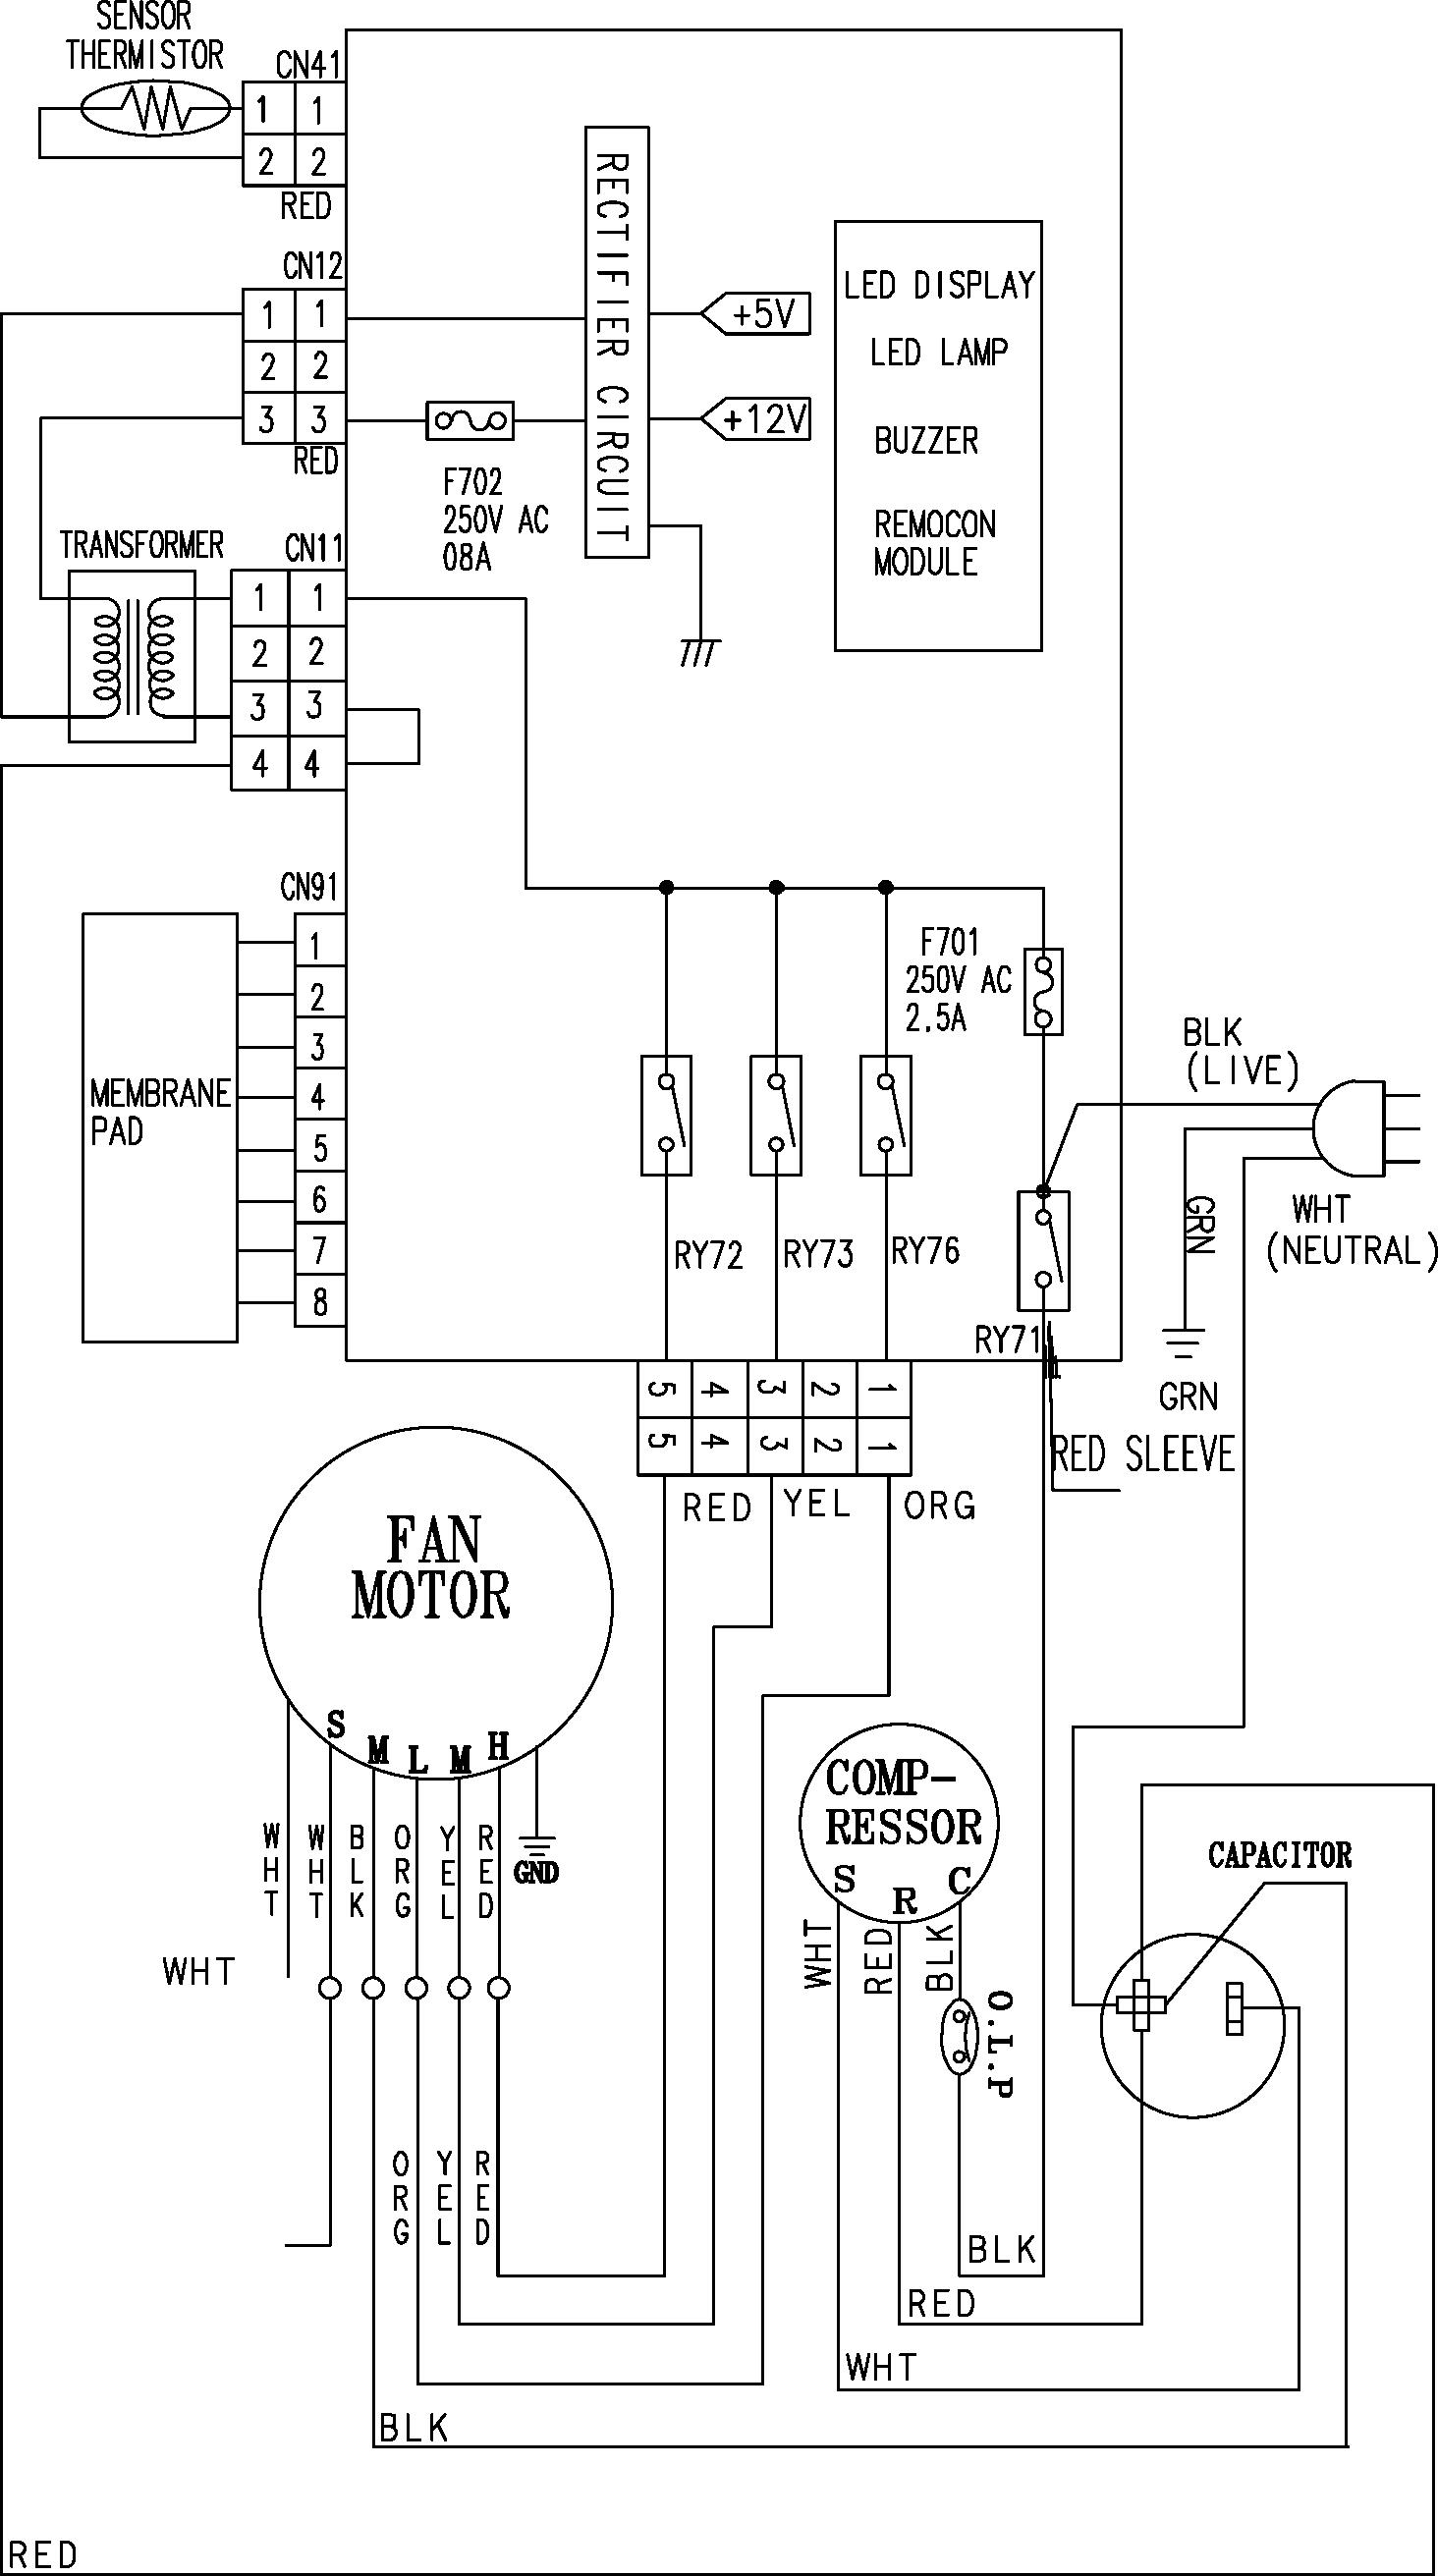 zc_7356] wiring information diagram and parts list for samsung ...  benkeme gentot mohammedshrine librar wiring 101